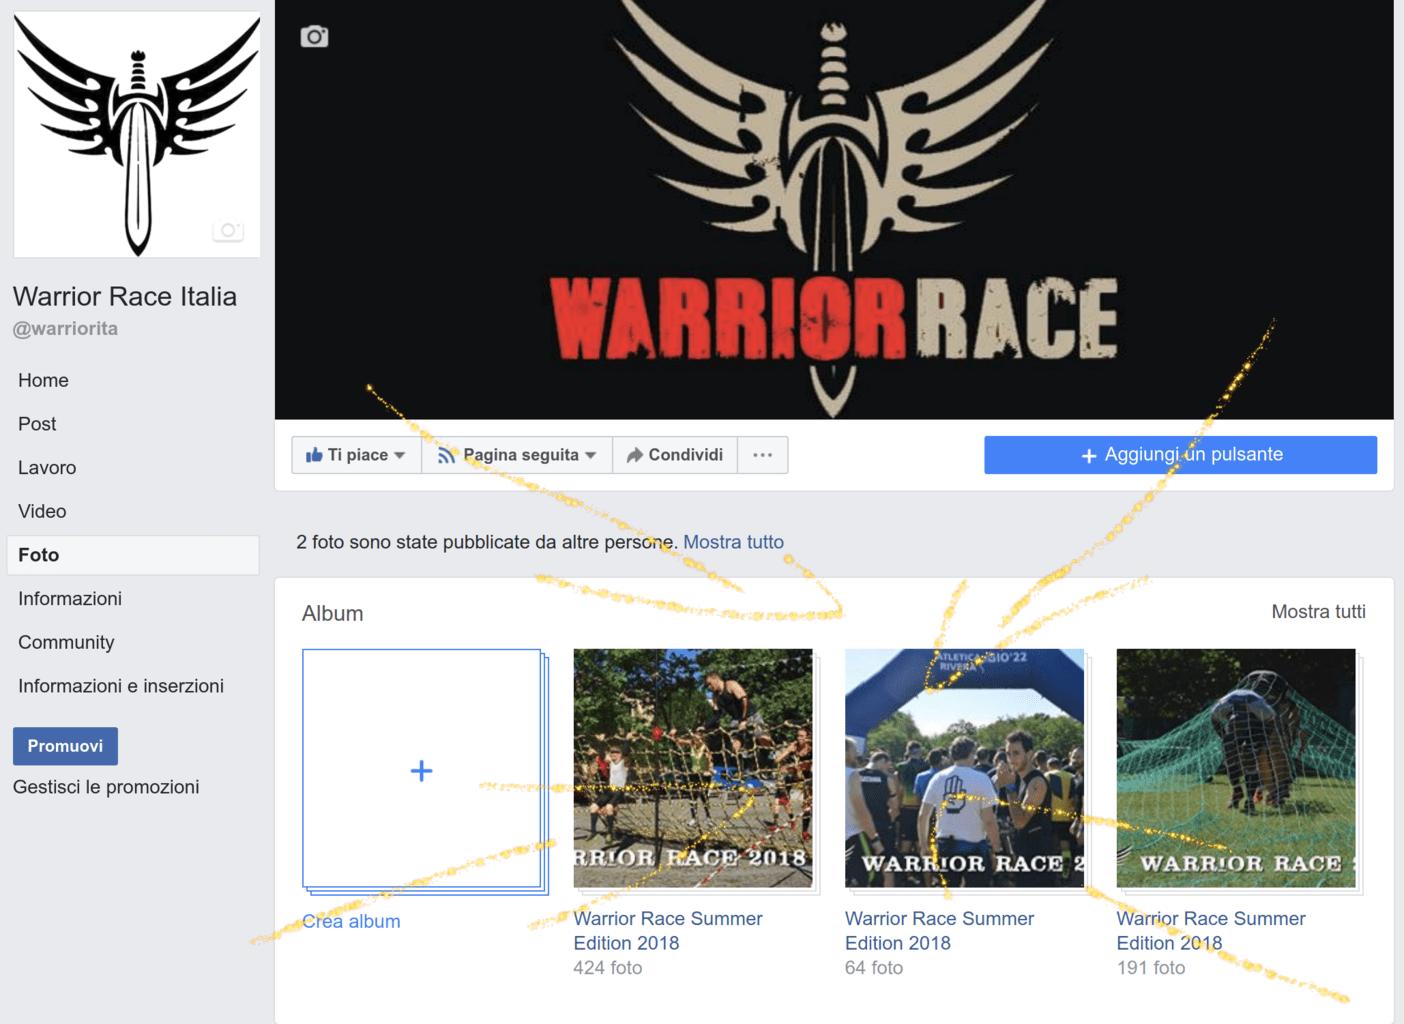 Warrior Race Summer Edition 2018 – LE FOTO